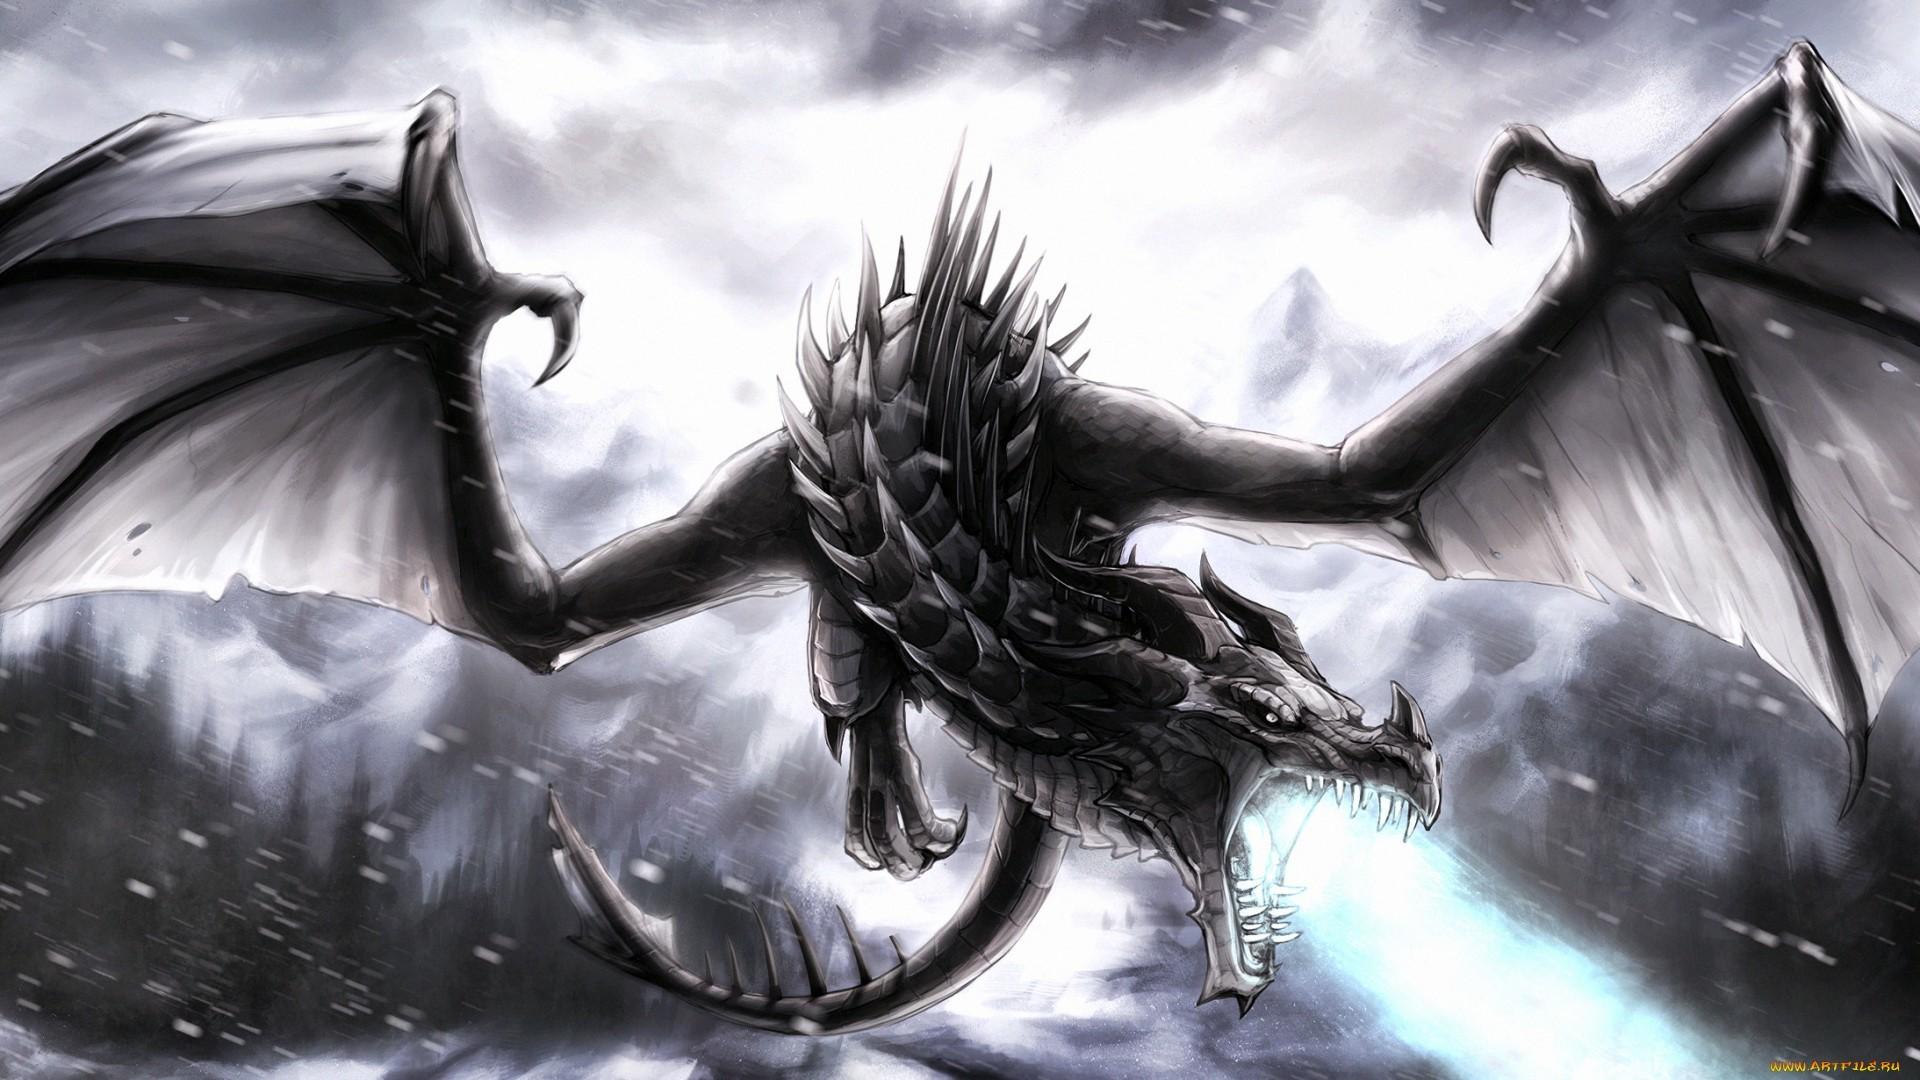 Hd Dragon Wallpaper Desktop 84 Images